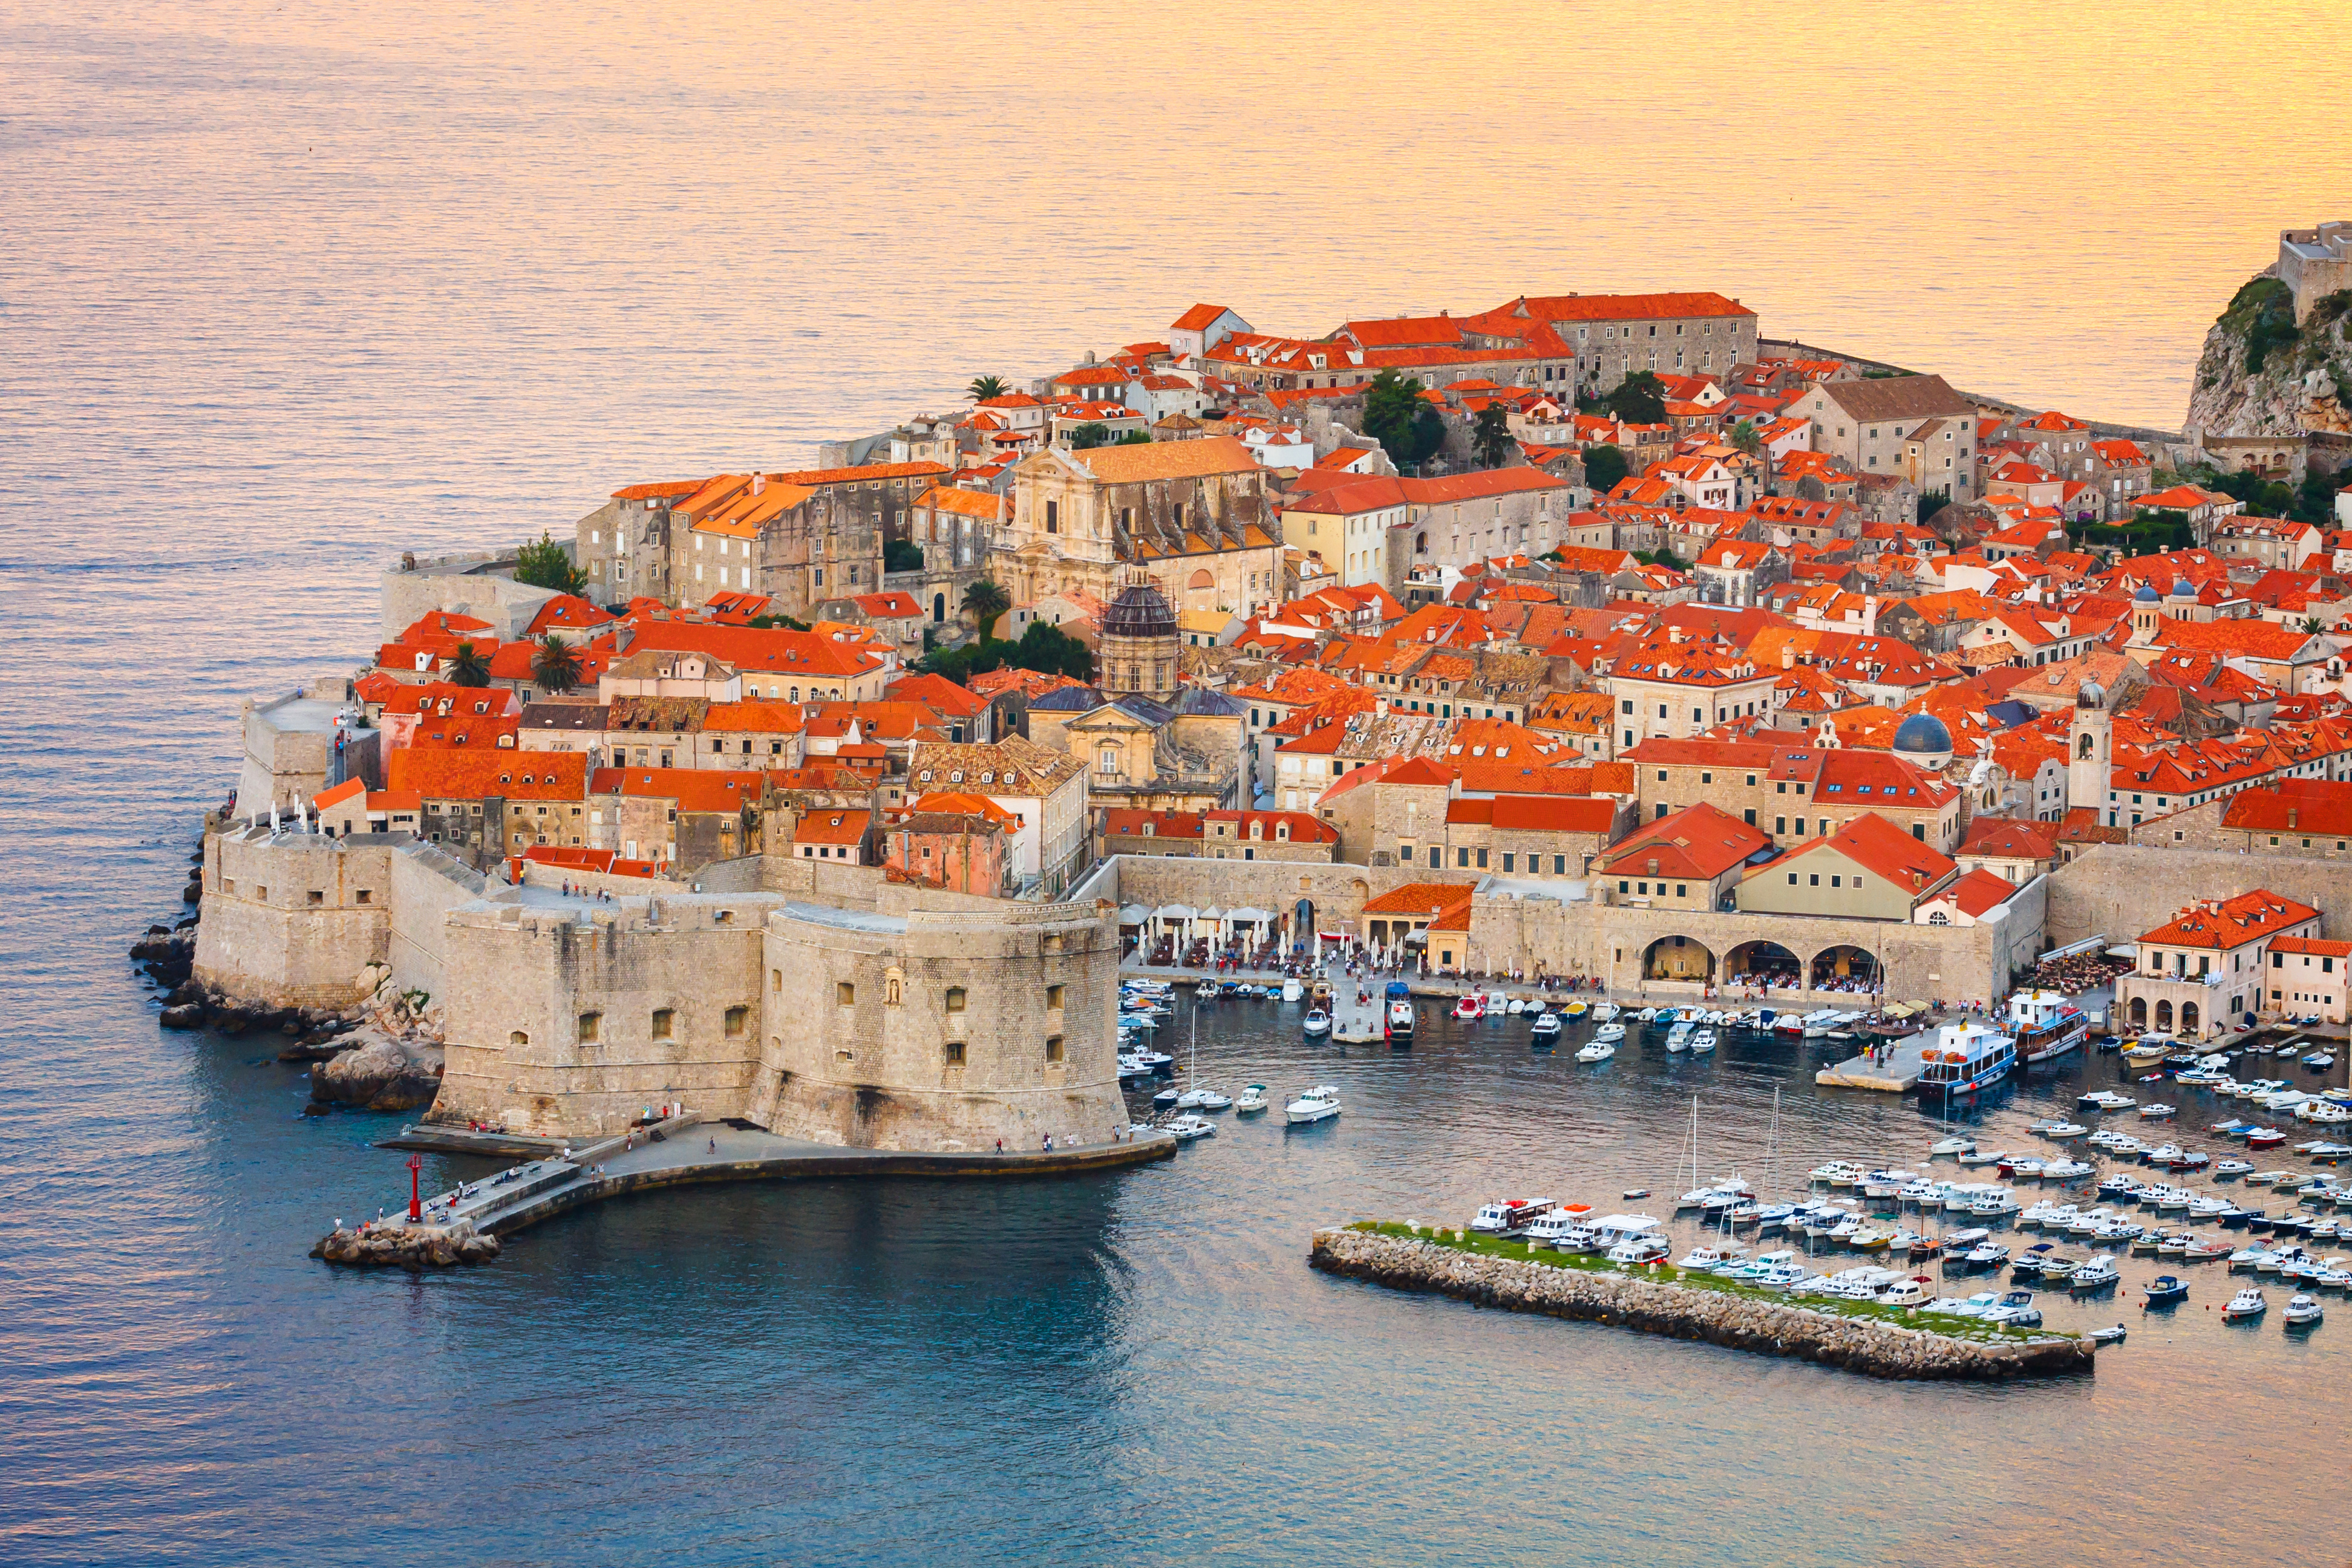 Digital Croatia? Depends on where you look!